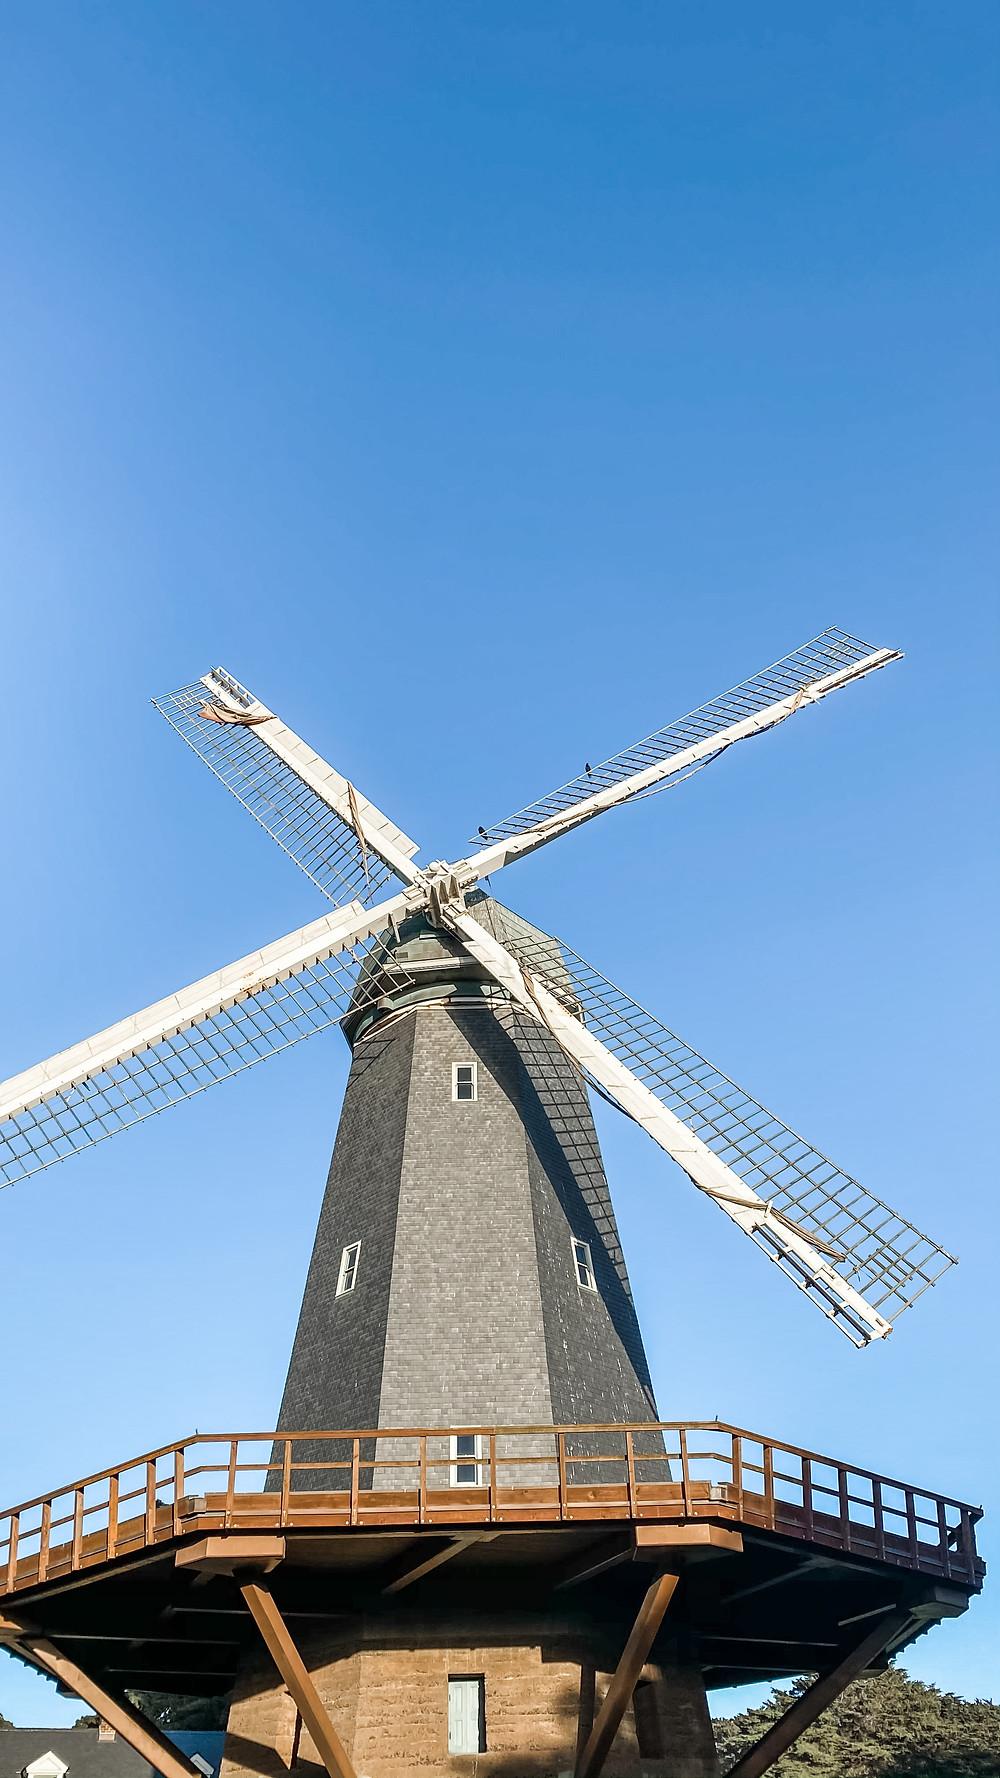 Murhpy Windmill in Golden Gate Park, San Francisco